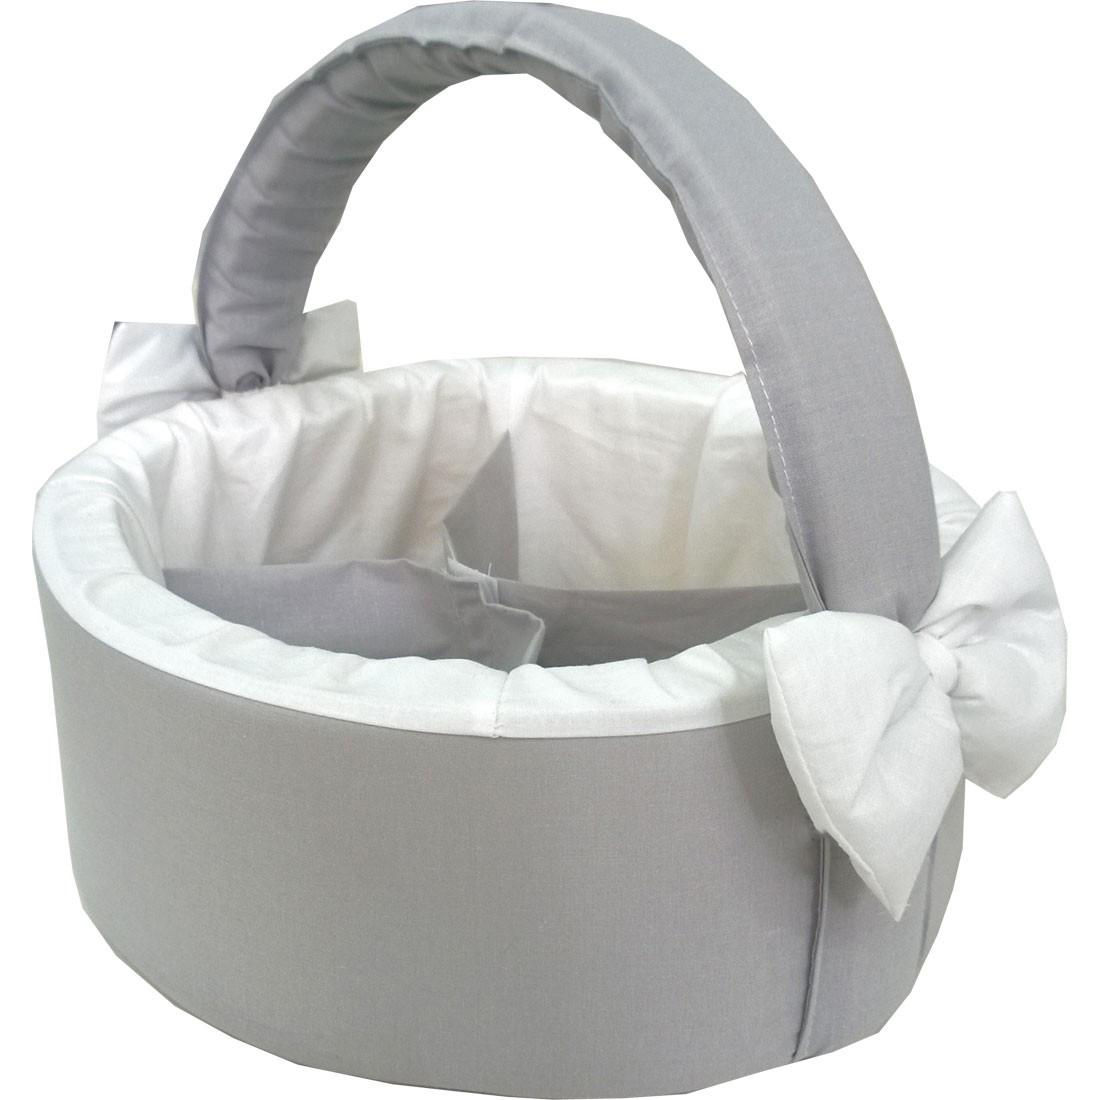 721cce0f009 Καλάθι Καλλυντικών Μωρού Γκρι λευκό Λευκά είδη/Προίκα